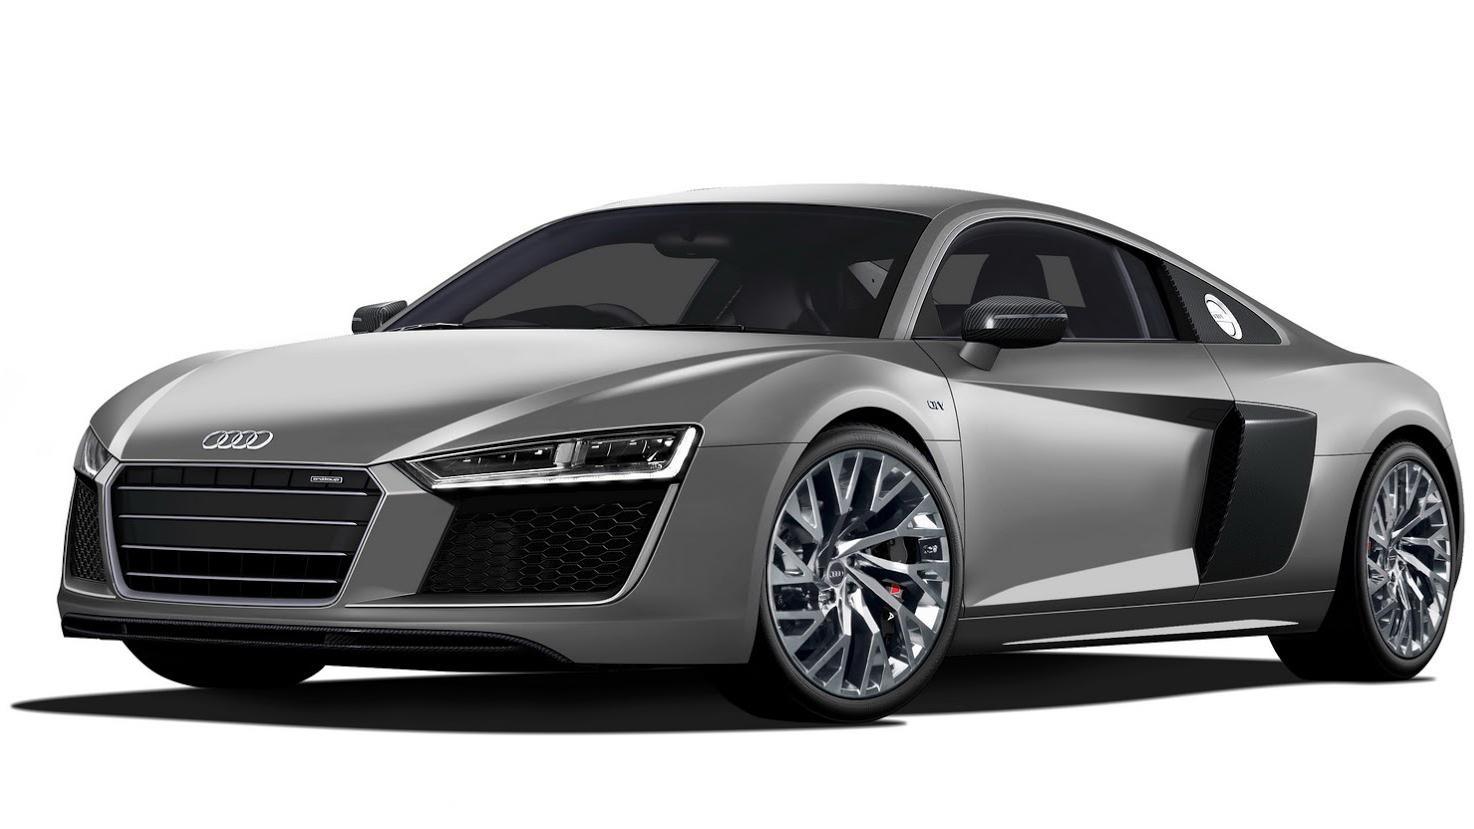 Kelebihan Audi Auto Harga